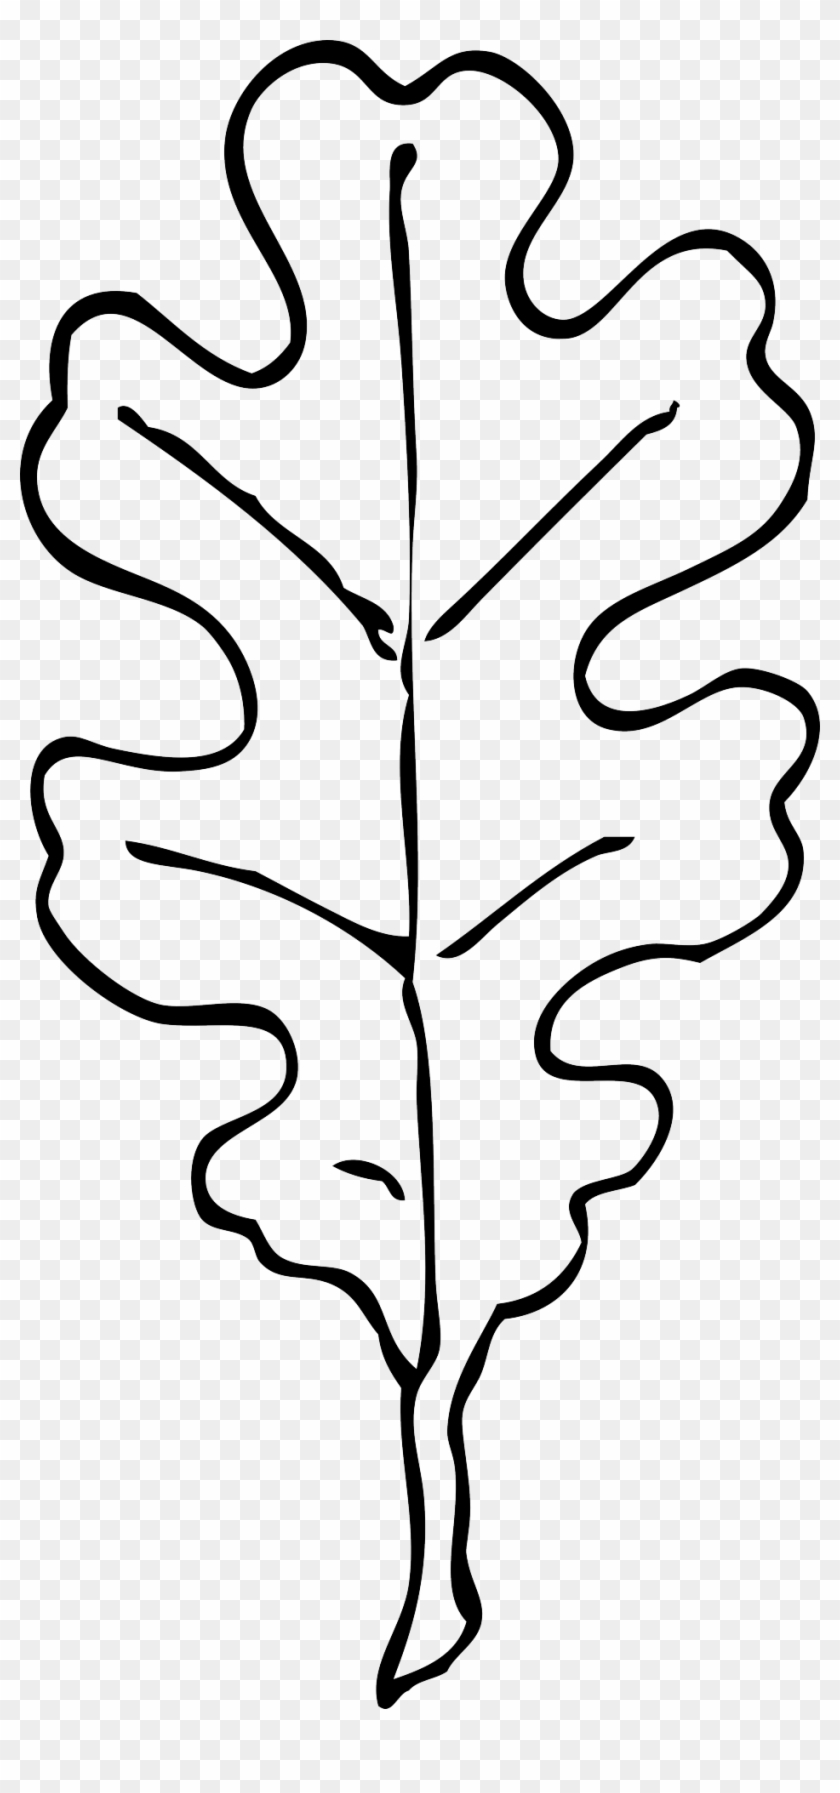 Oak Leaves Coloring Pages Oak Leaf Clip Art Free